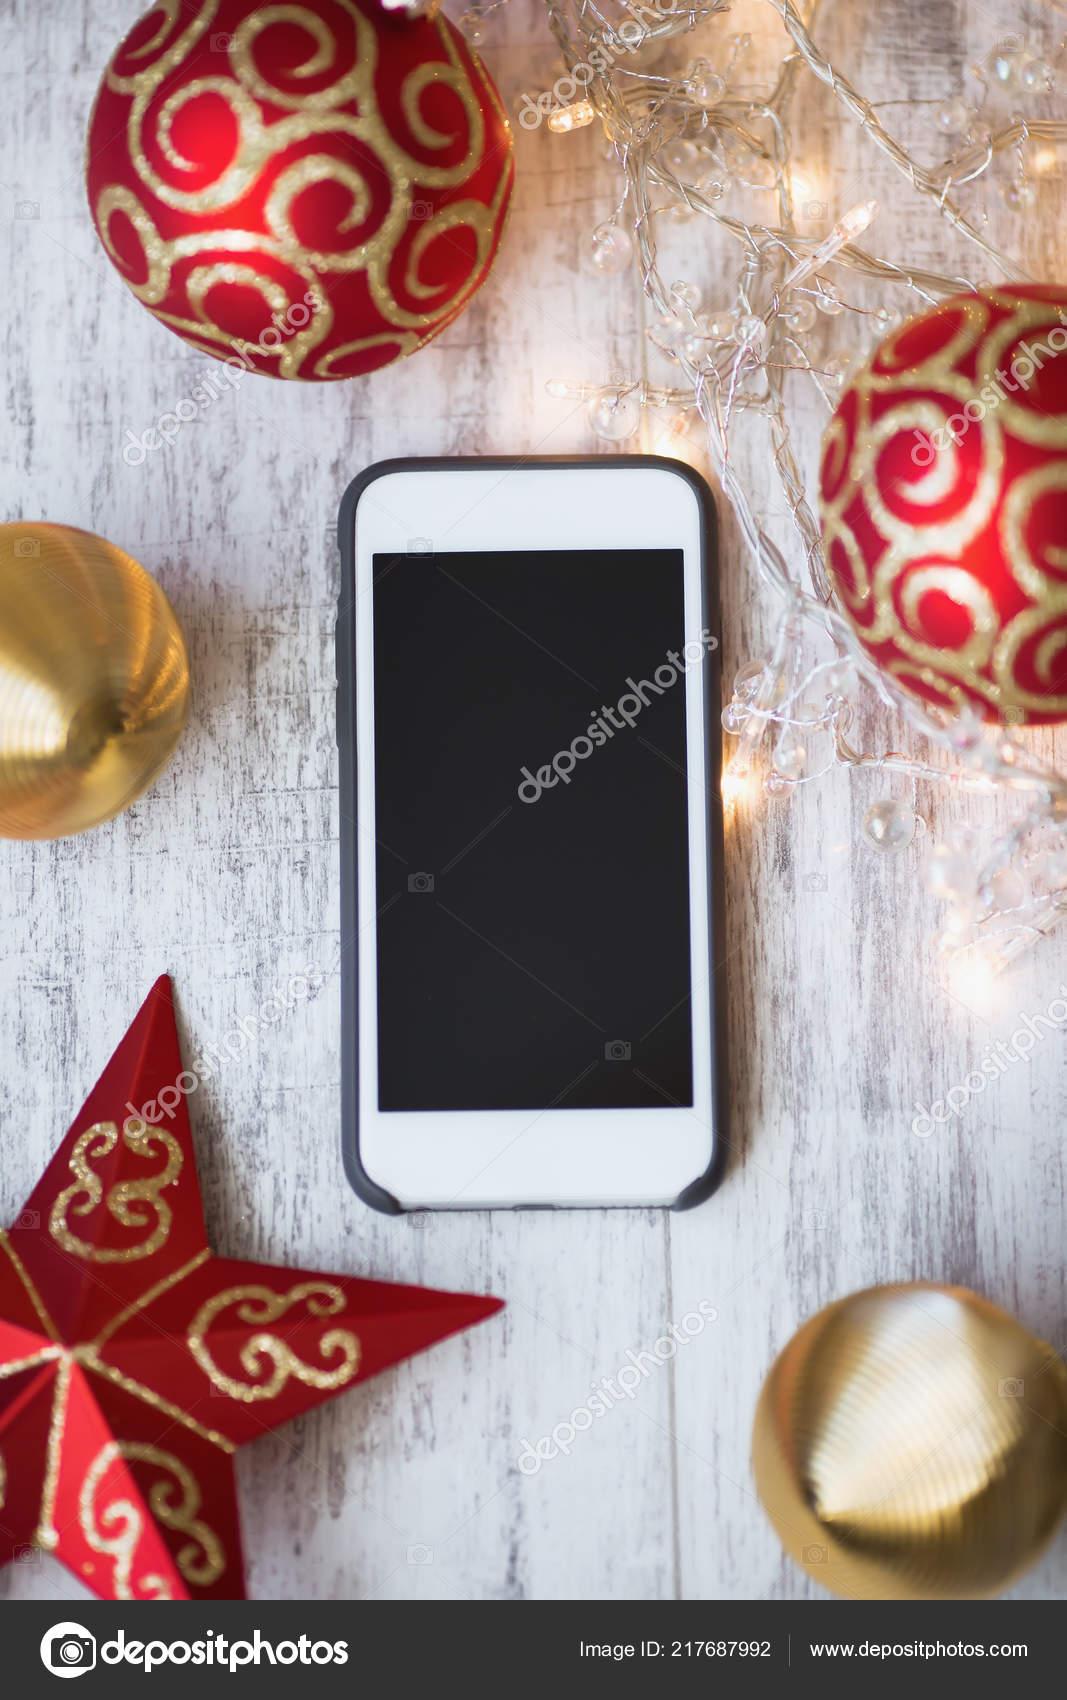 Madera — Smartphone Fondo Blanco Luces Foto Con Juguetes Navidad De vm8wNn0O